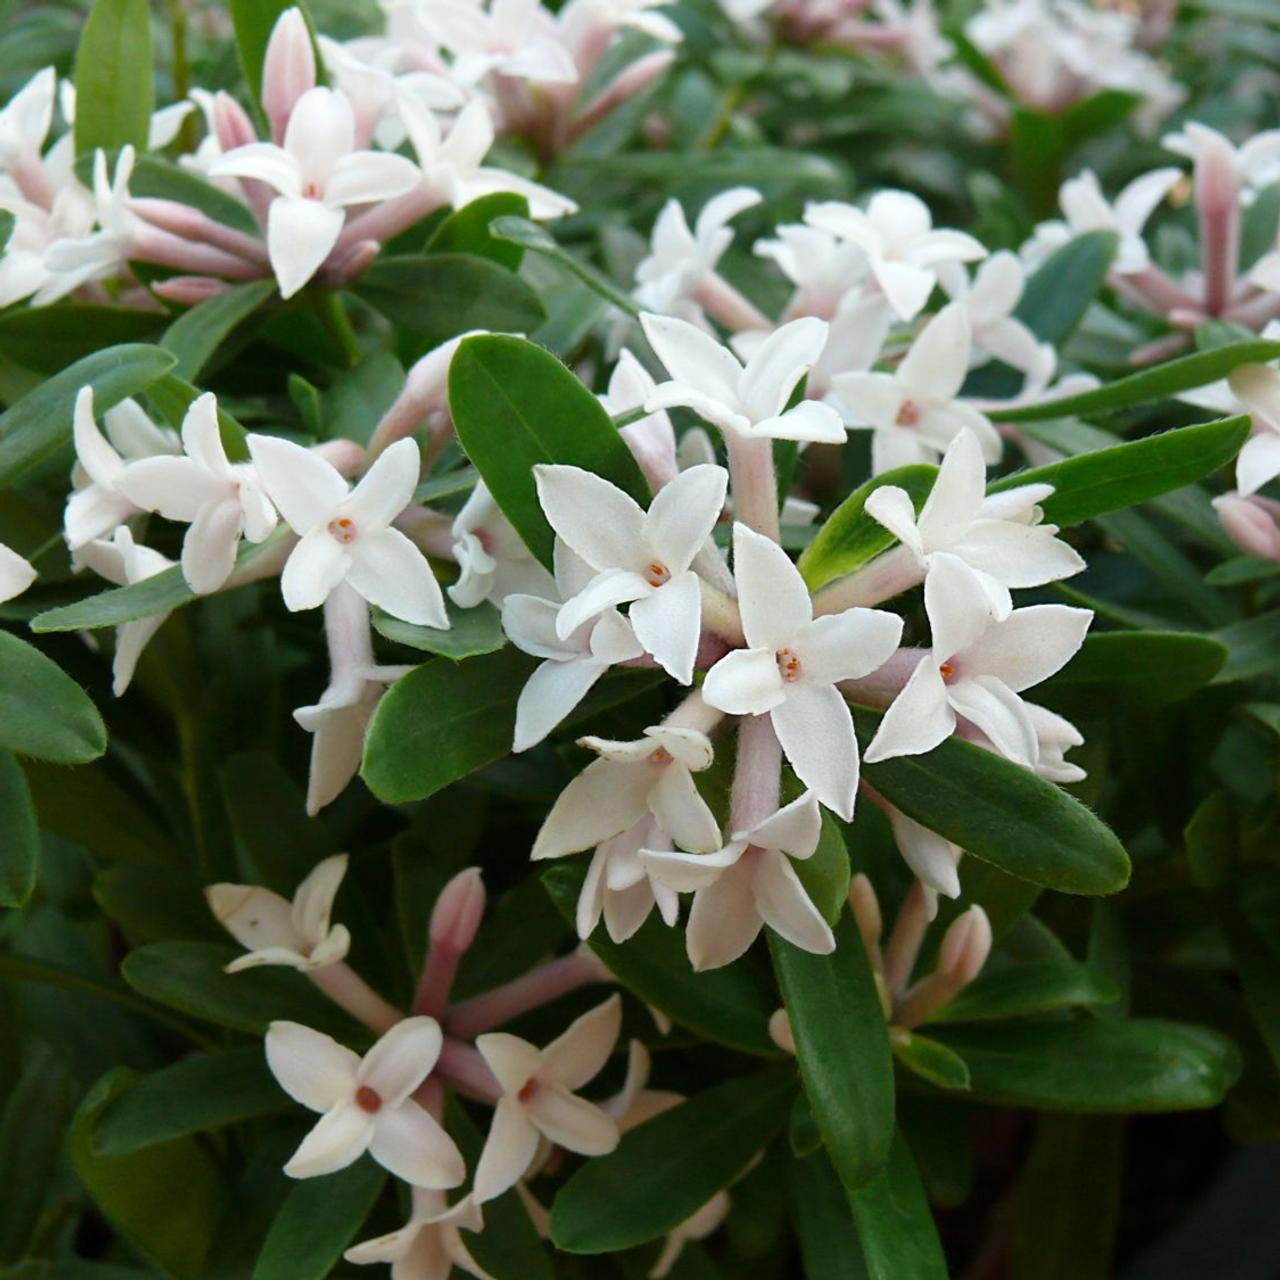 Daphne x transatlantica 'Eternal Fragrance' plant